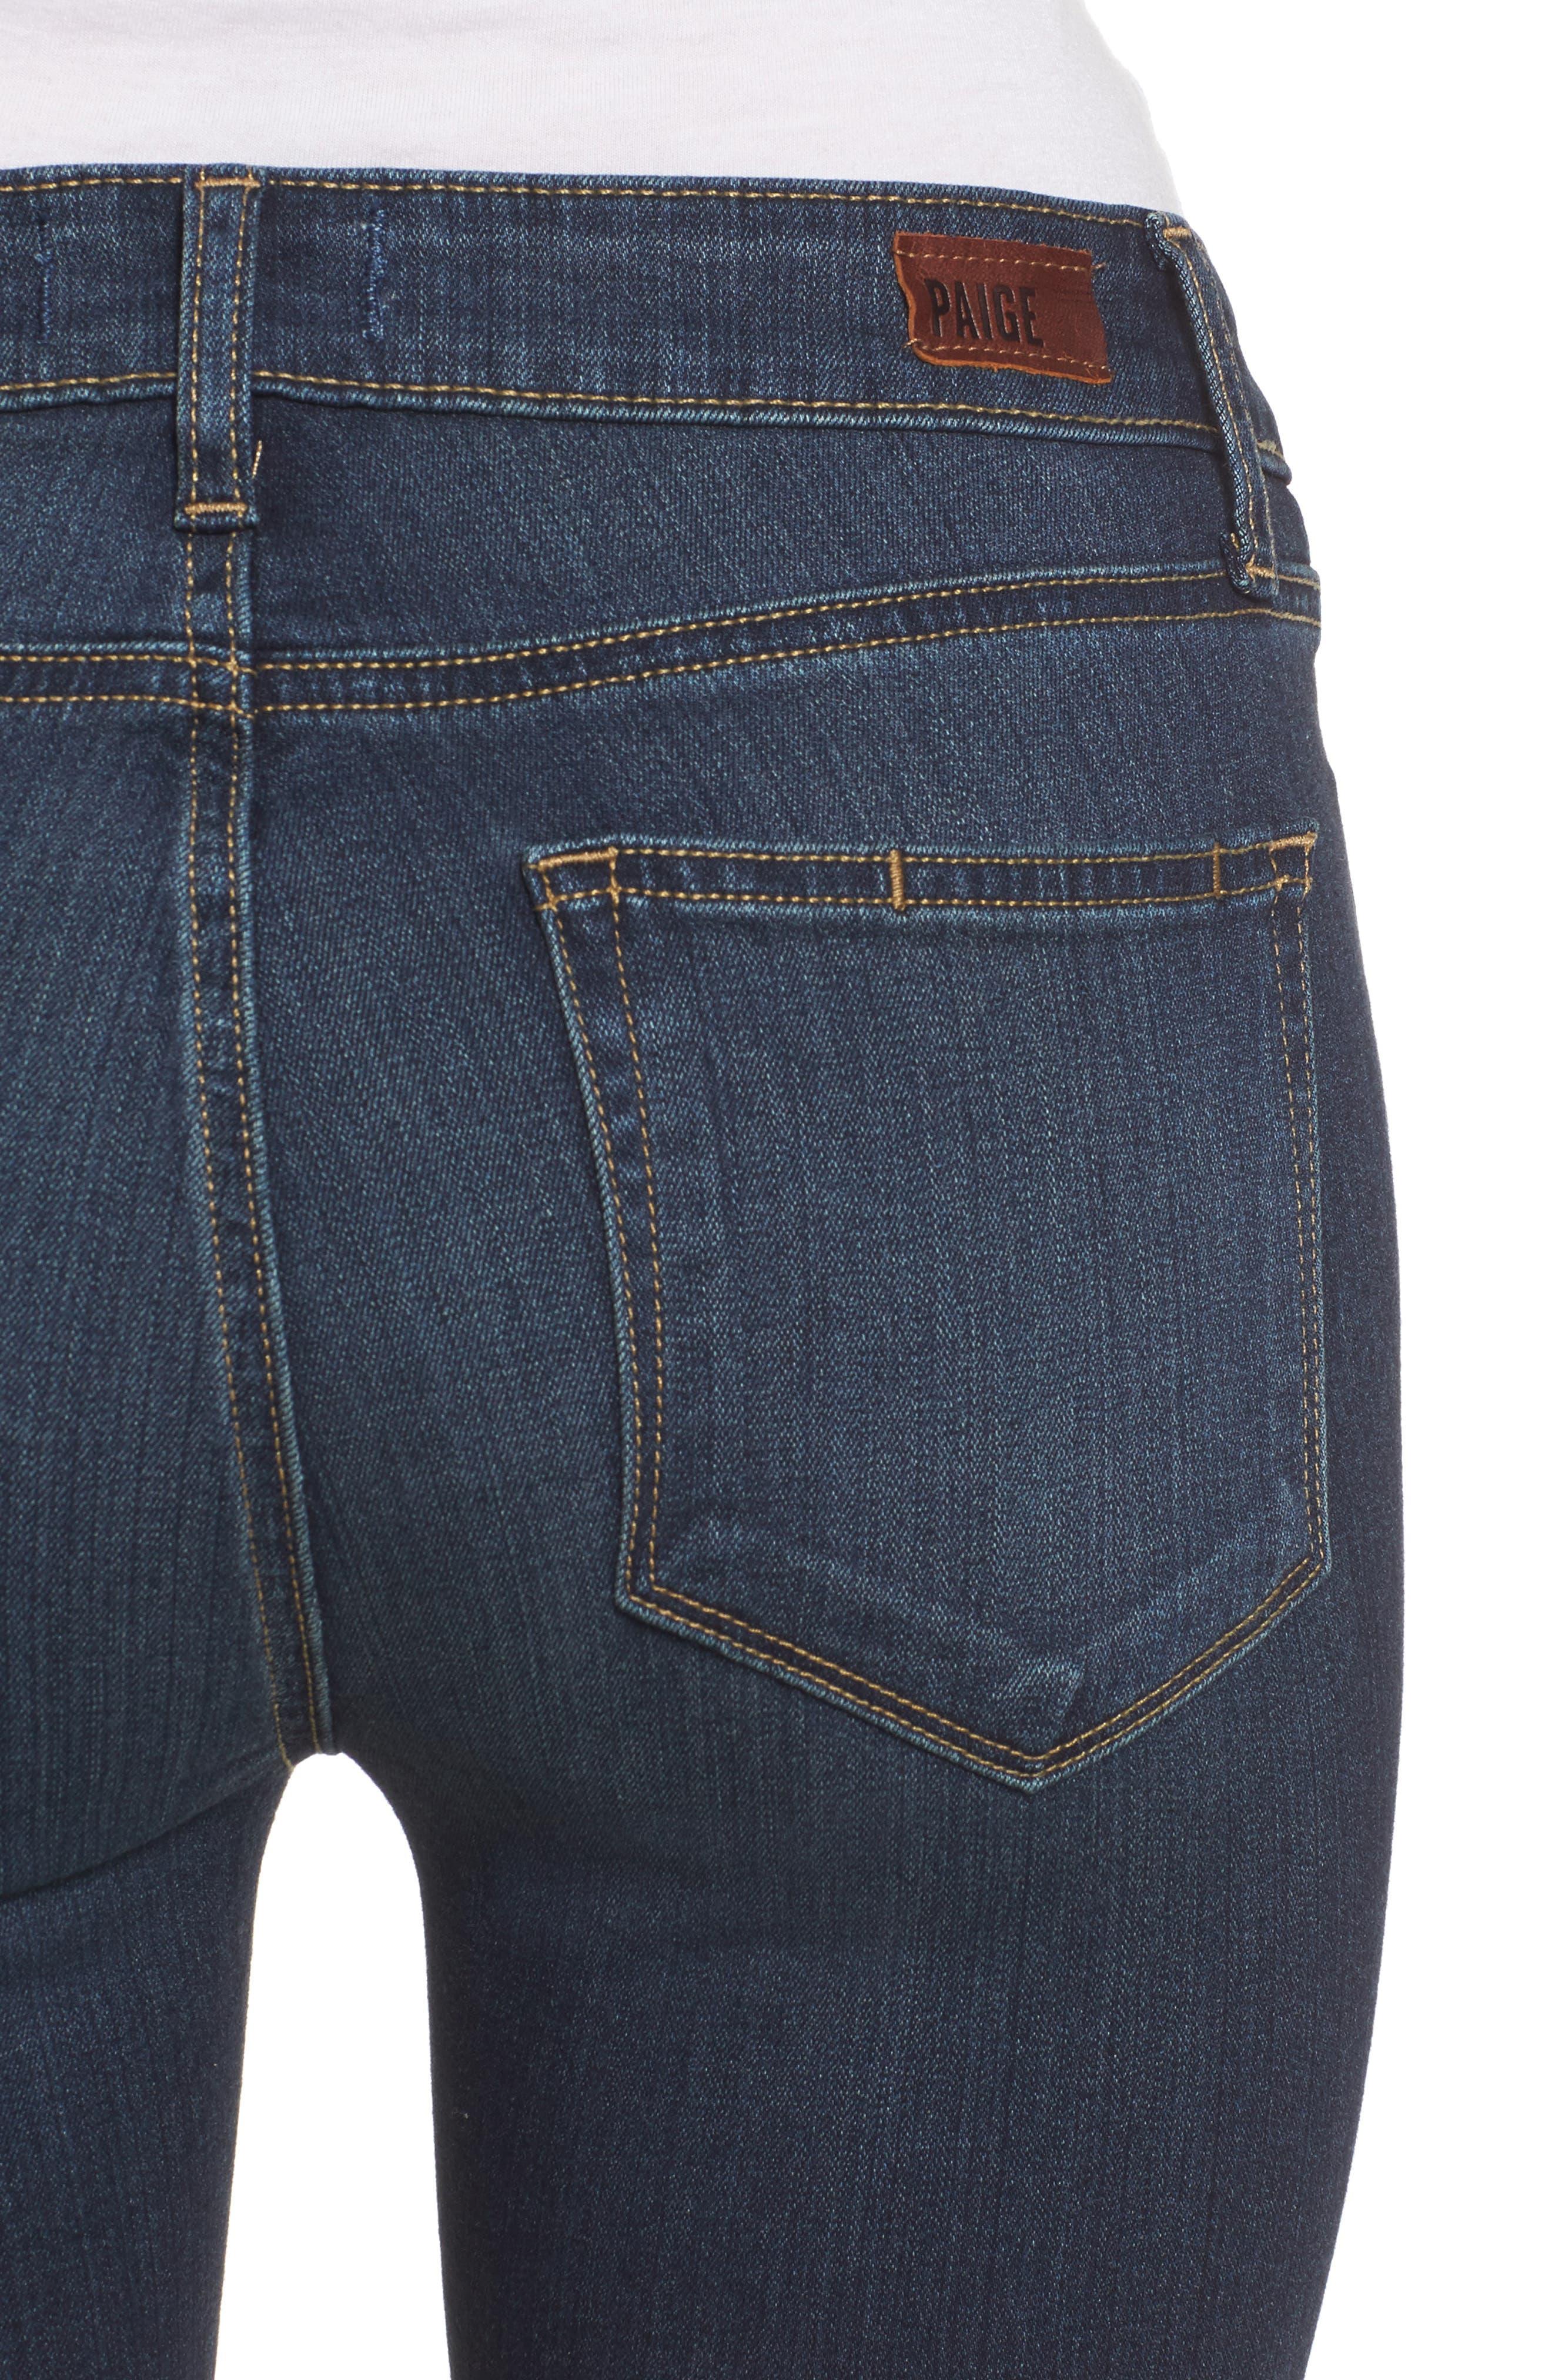 Transcend - Manhattan Bootcut Jeans,                             Alternate thumbnail 4, color,                             NOTTINGHAM